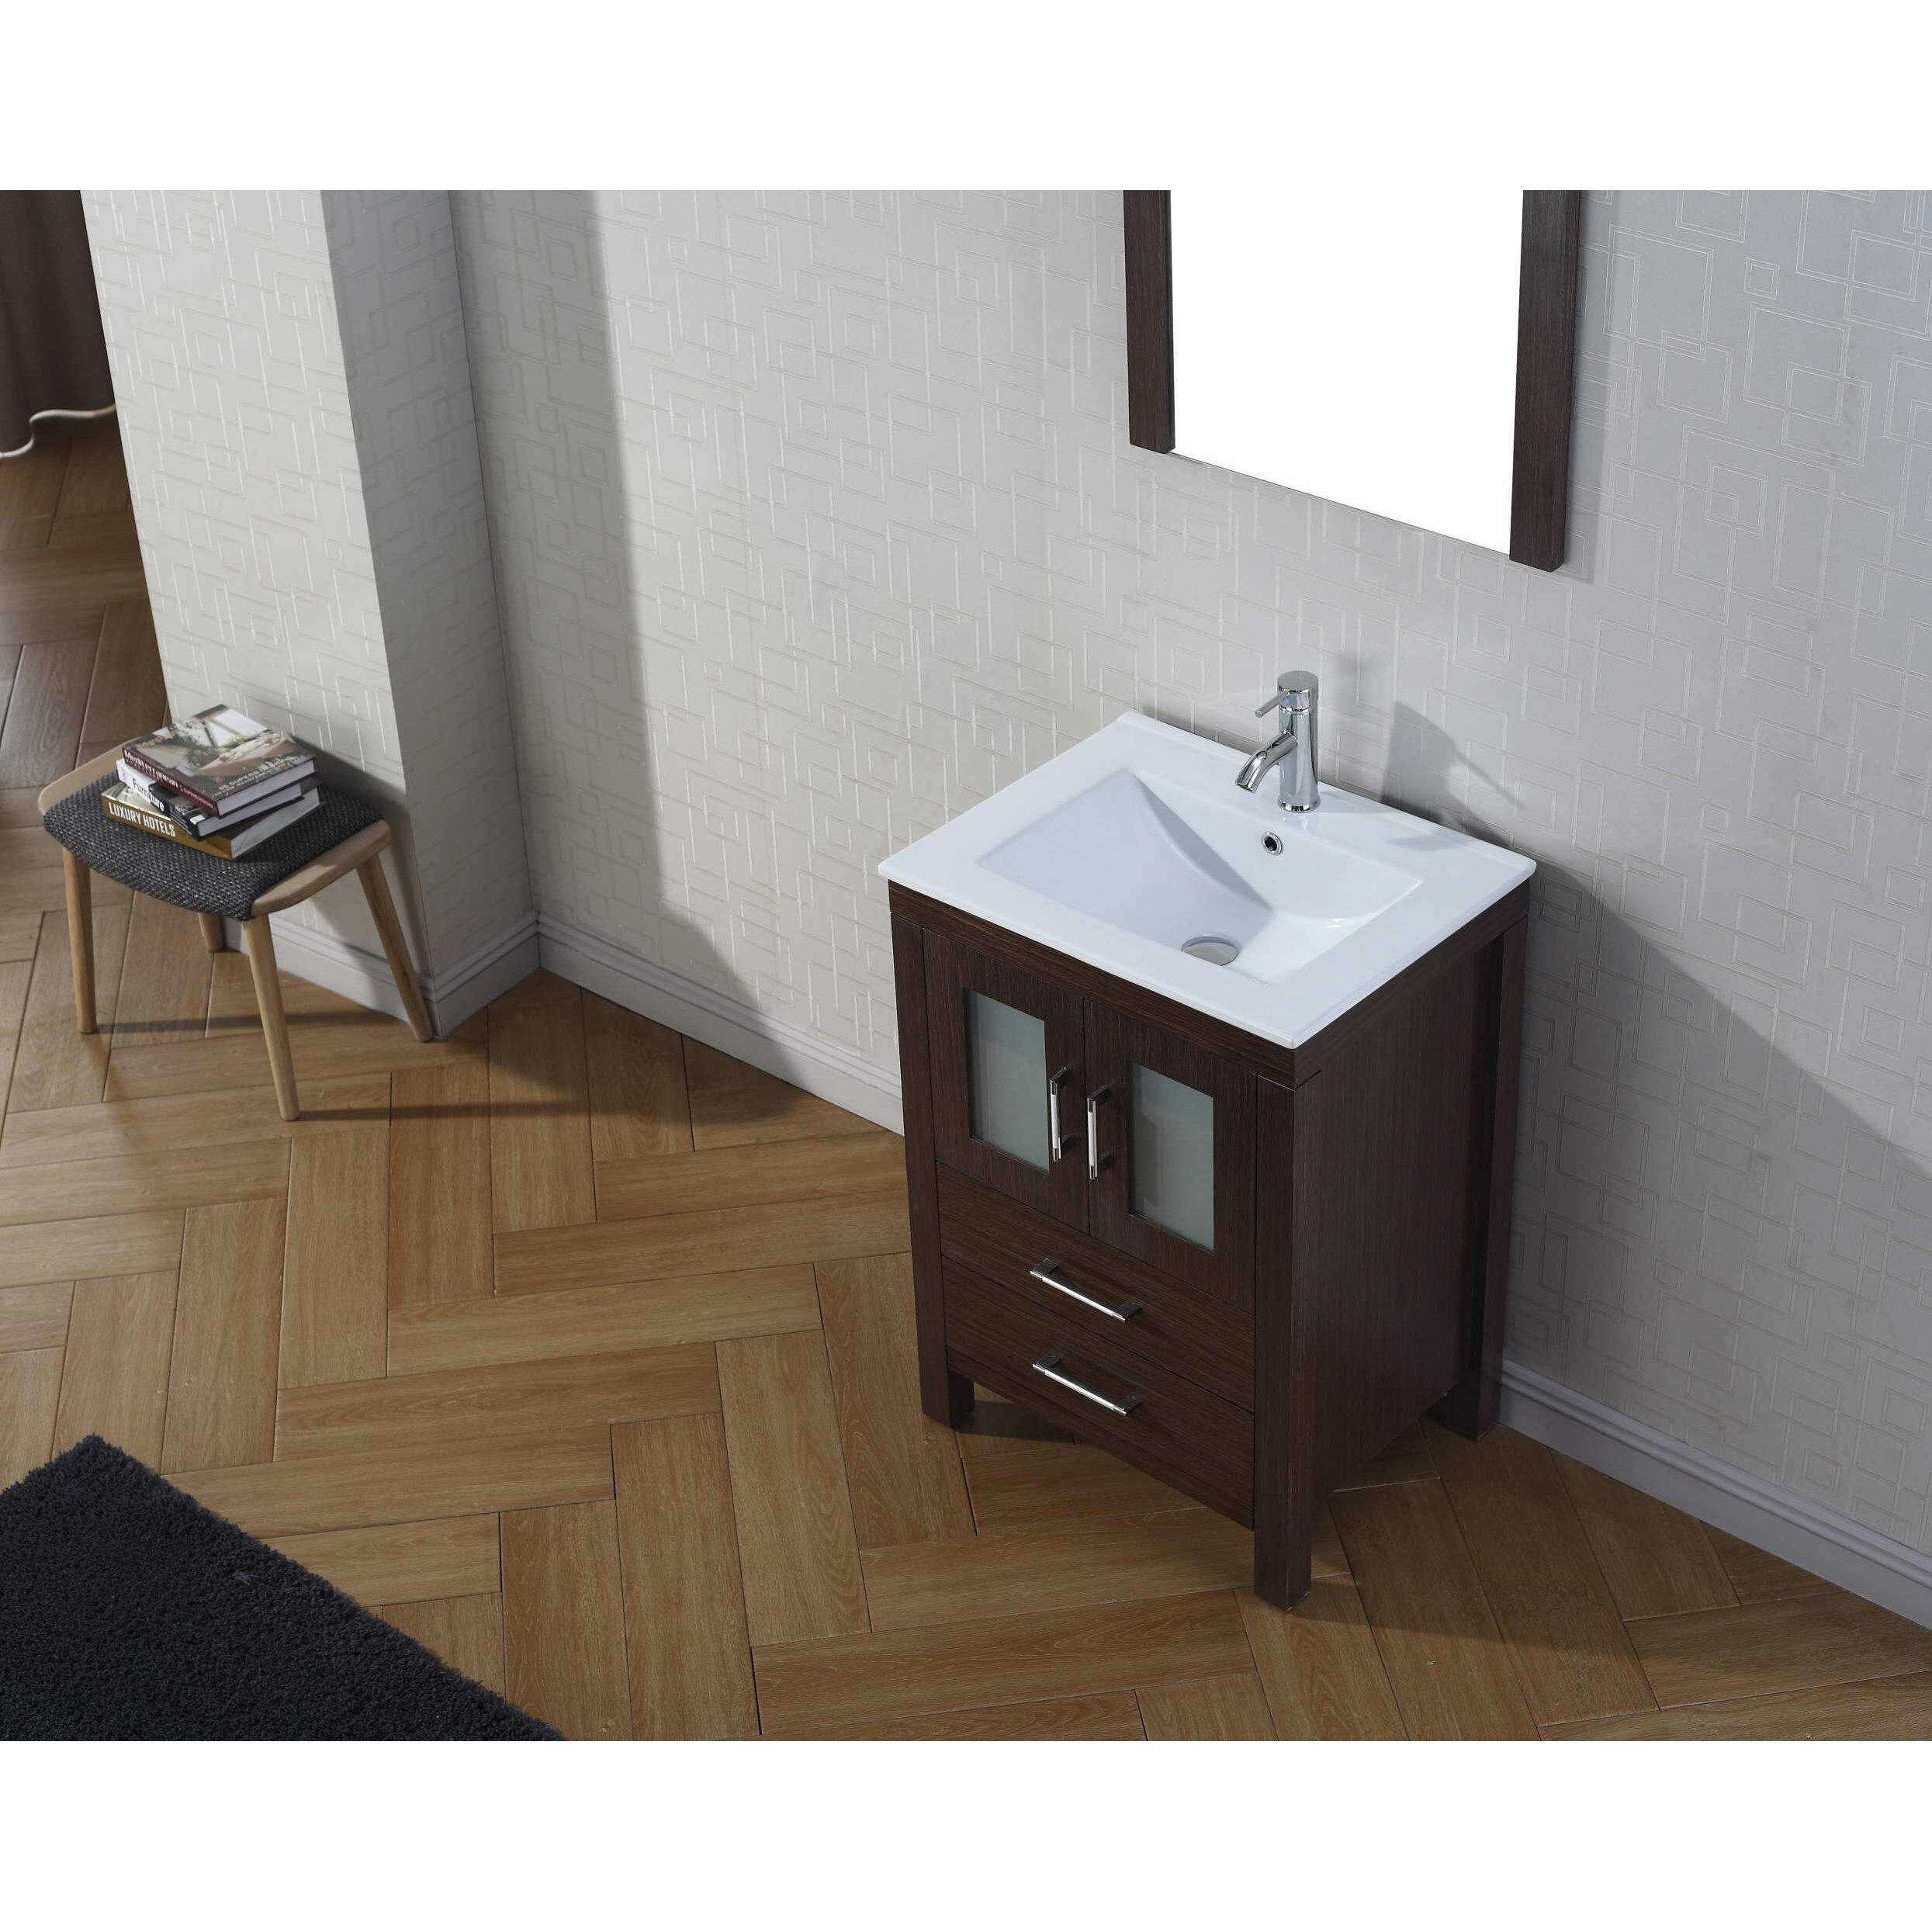 Bathroom Vanities Brooklyn bathroom vanities brooklyn mcdonald avenue - bathroom design